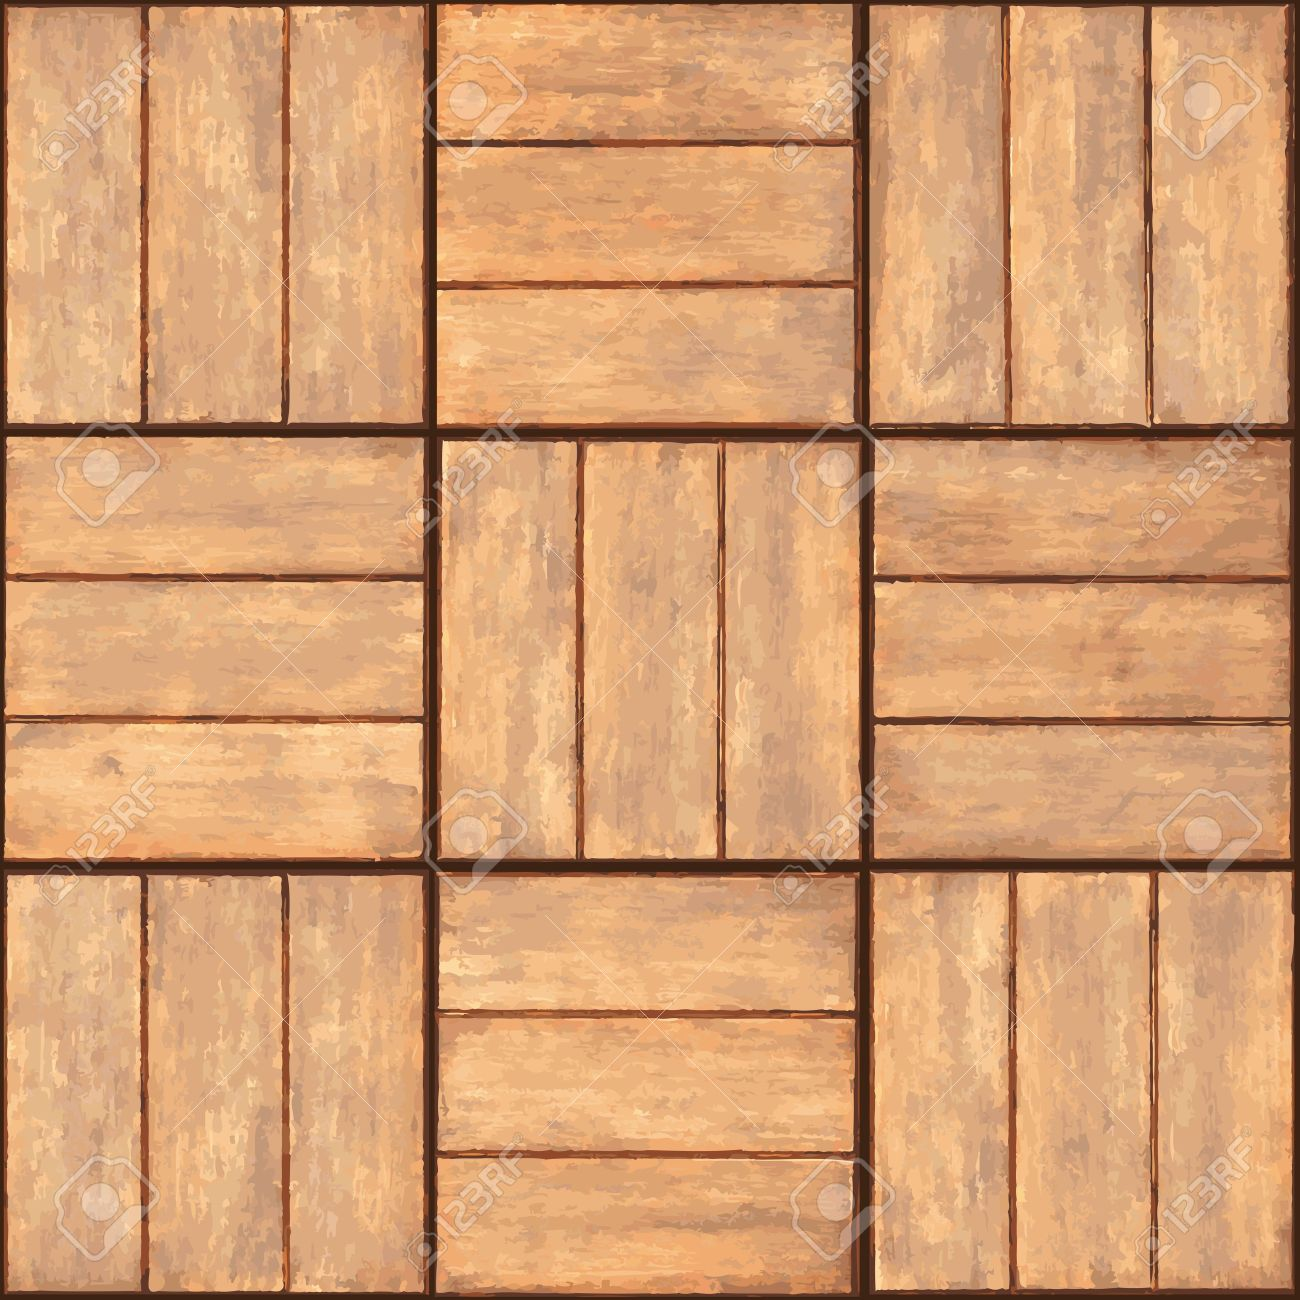 Tiled texture clipart.